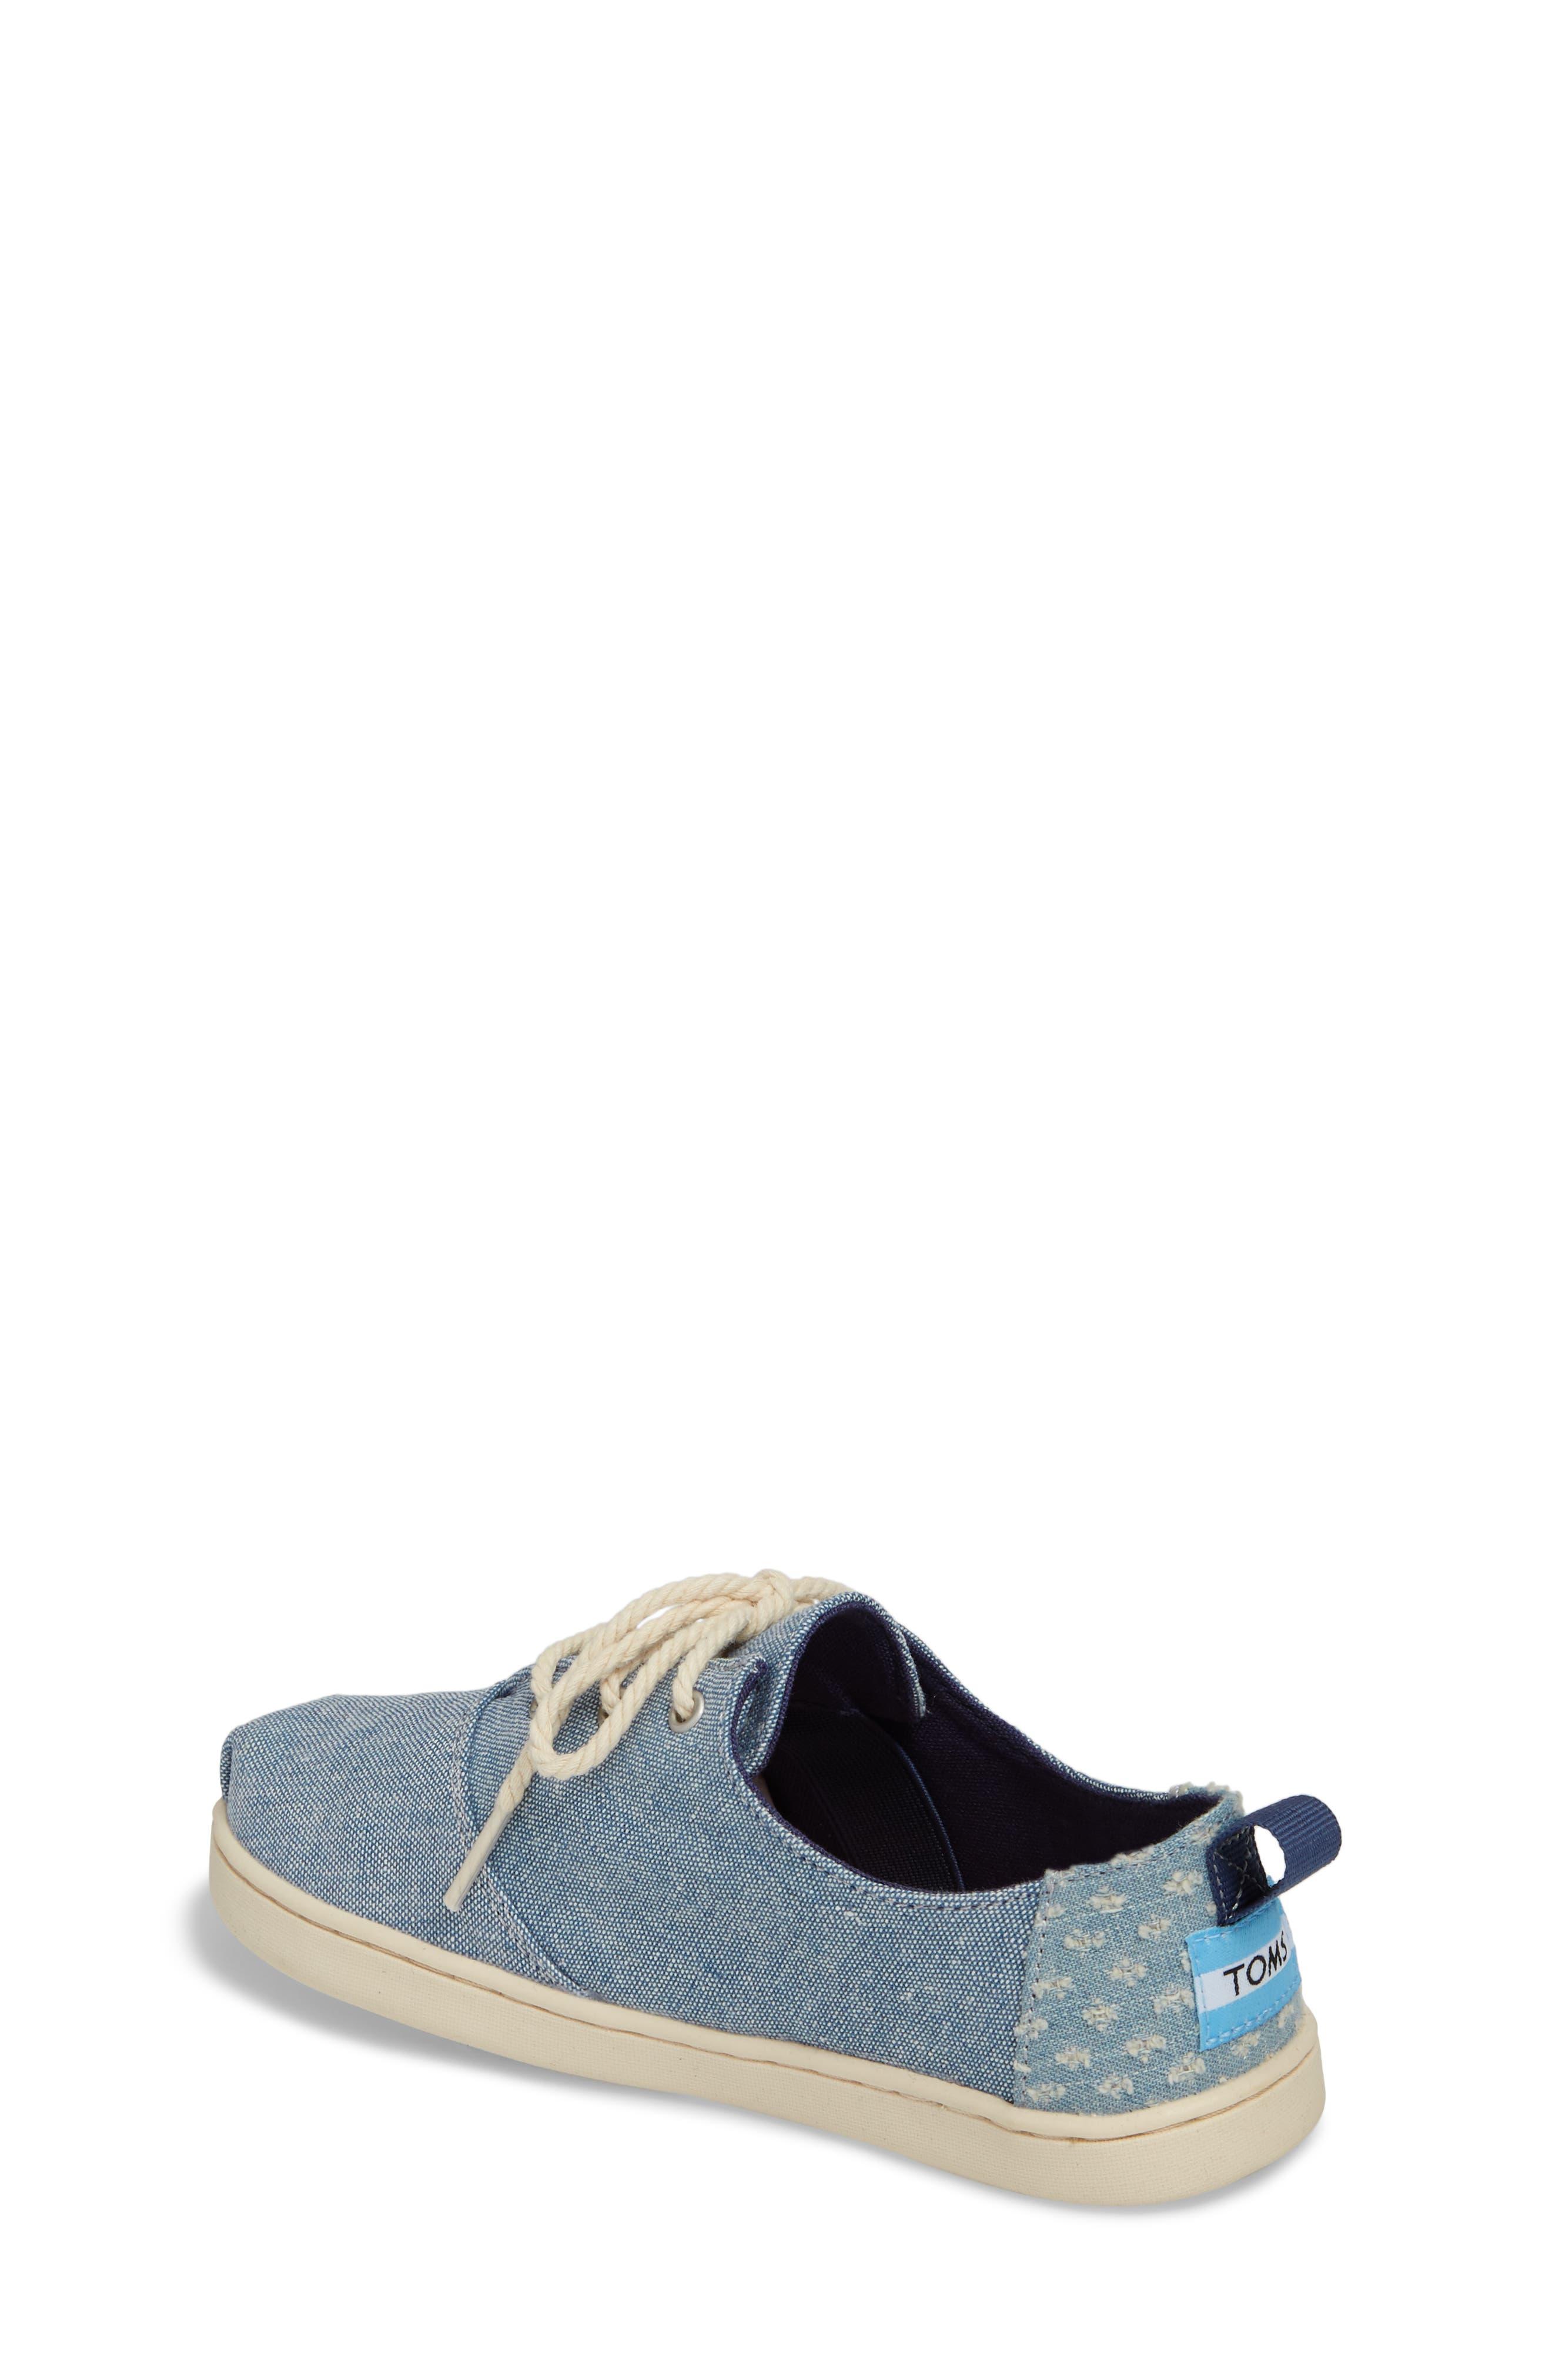 Lumin Sneaker,                             Alternate thumbnail 2, color,                             Blue Chambray